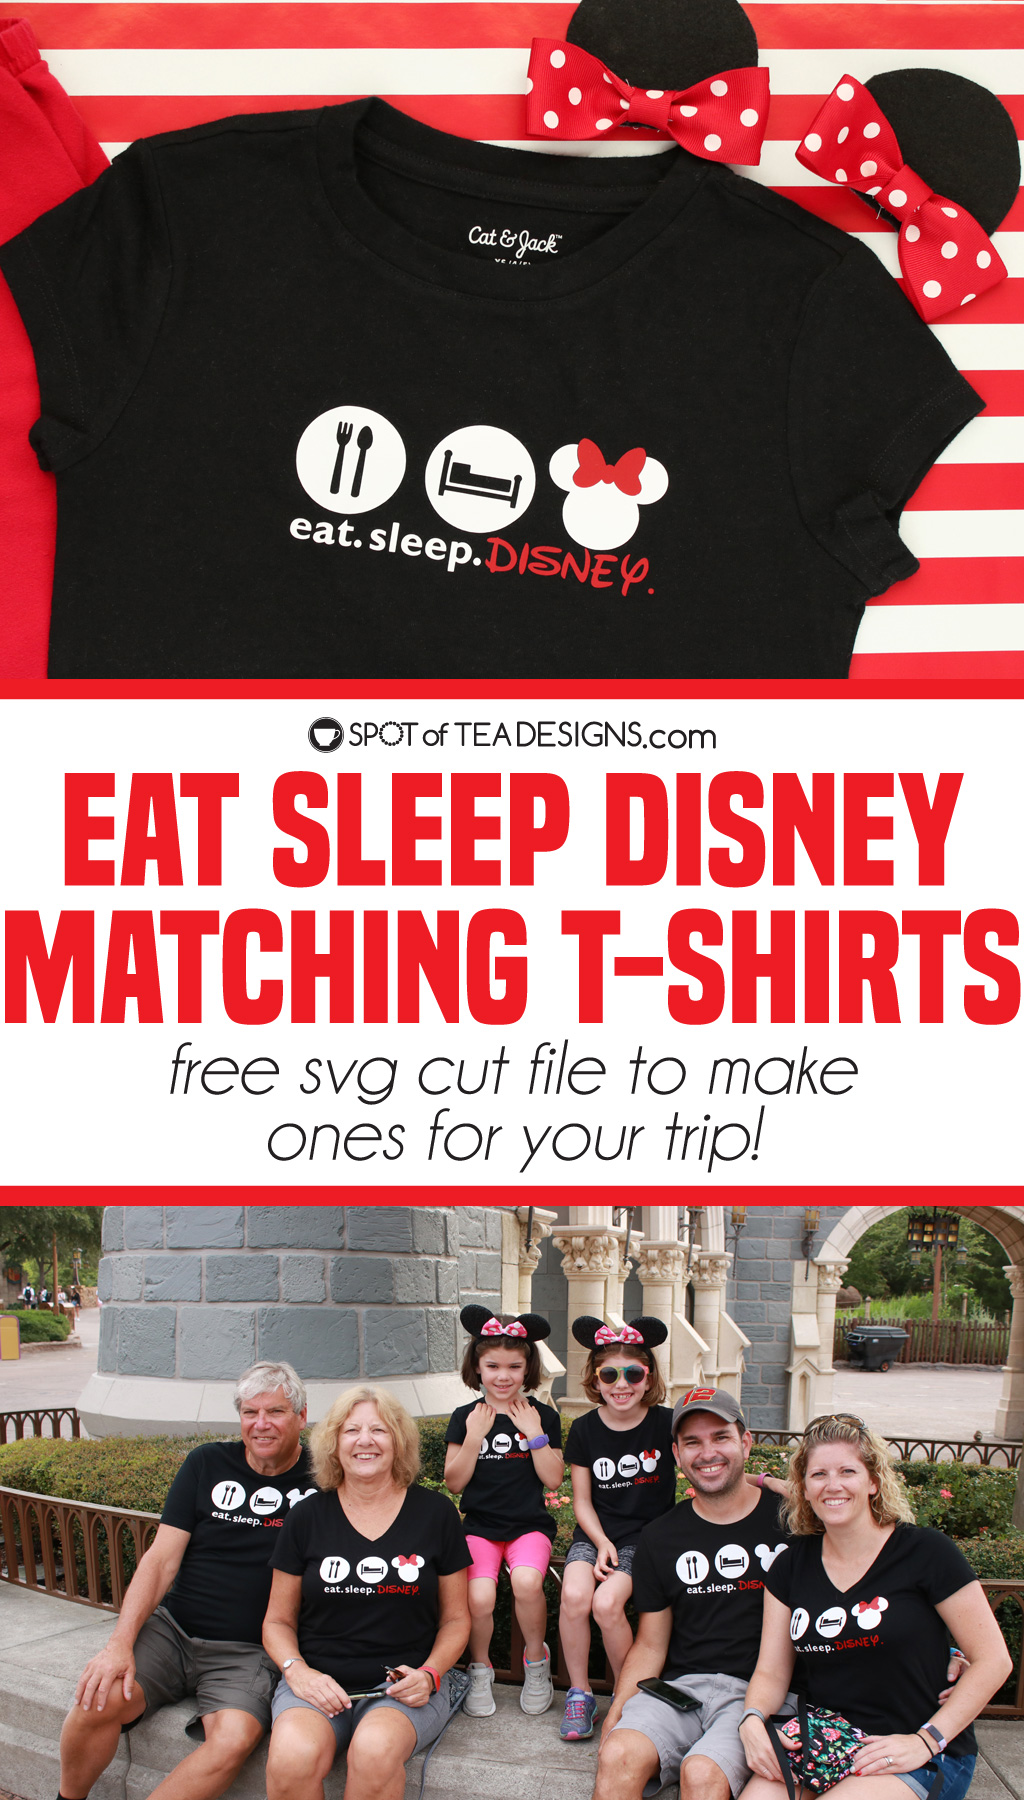 Eat sleep Disney matching t-shirts with free svg cut file   spotofteadesigns.com